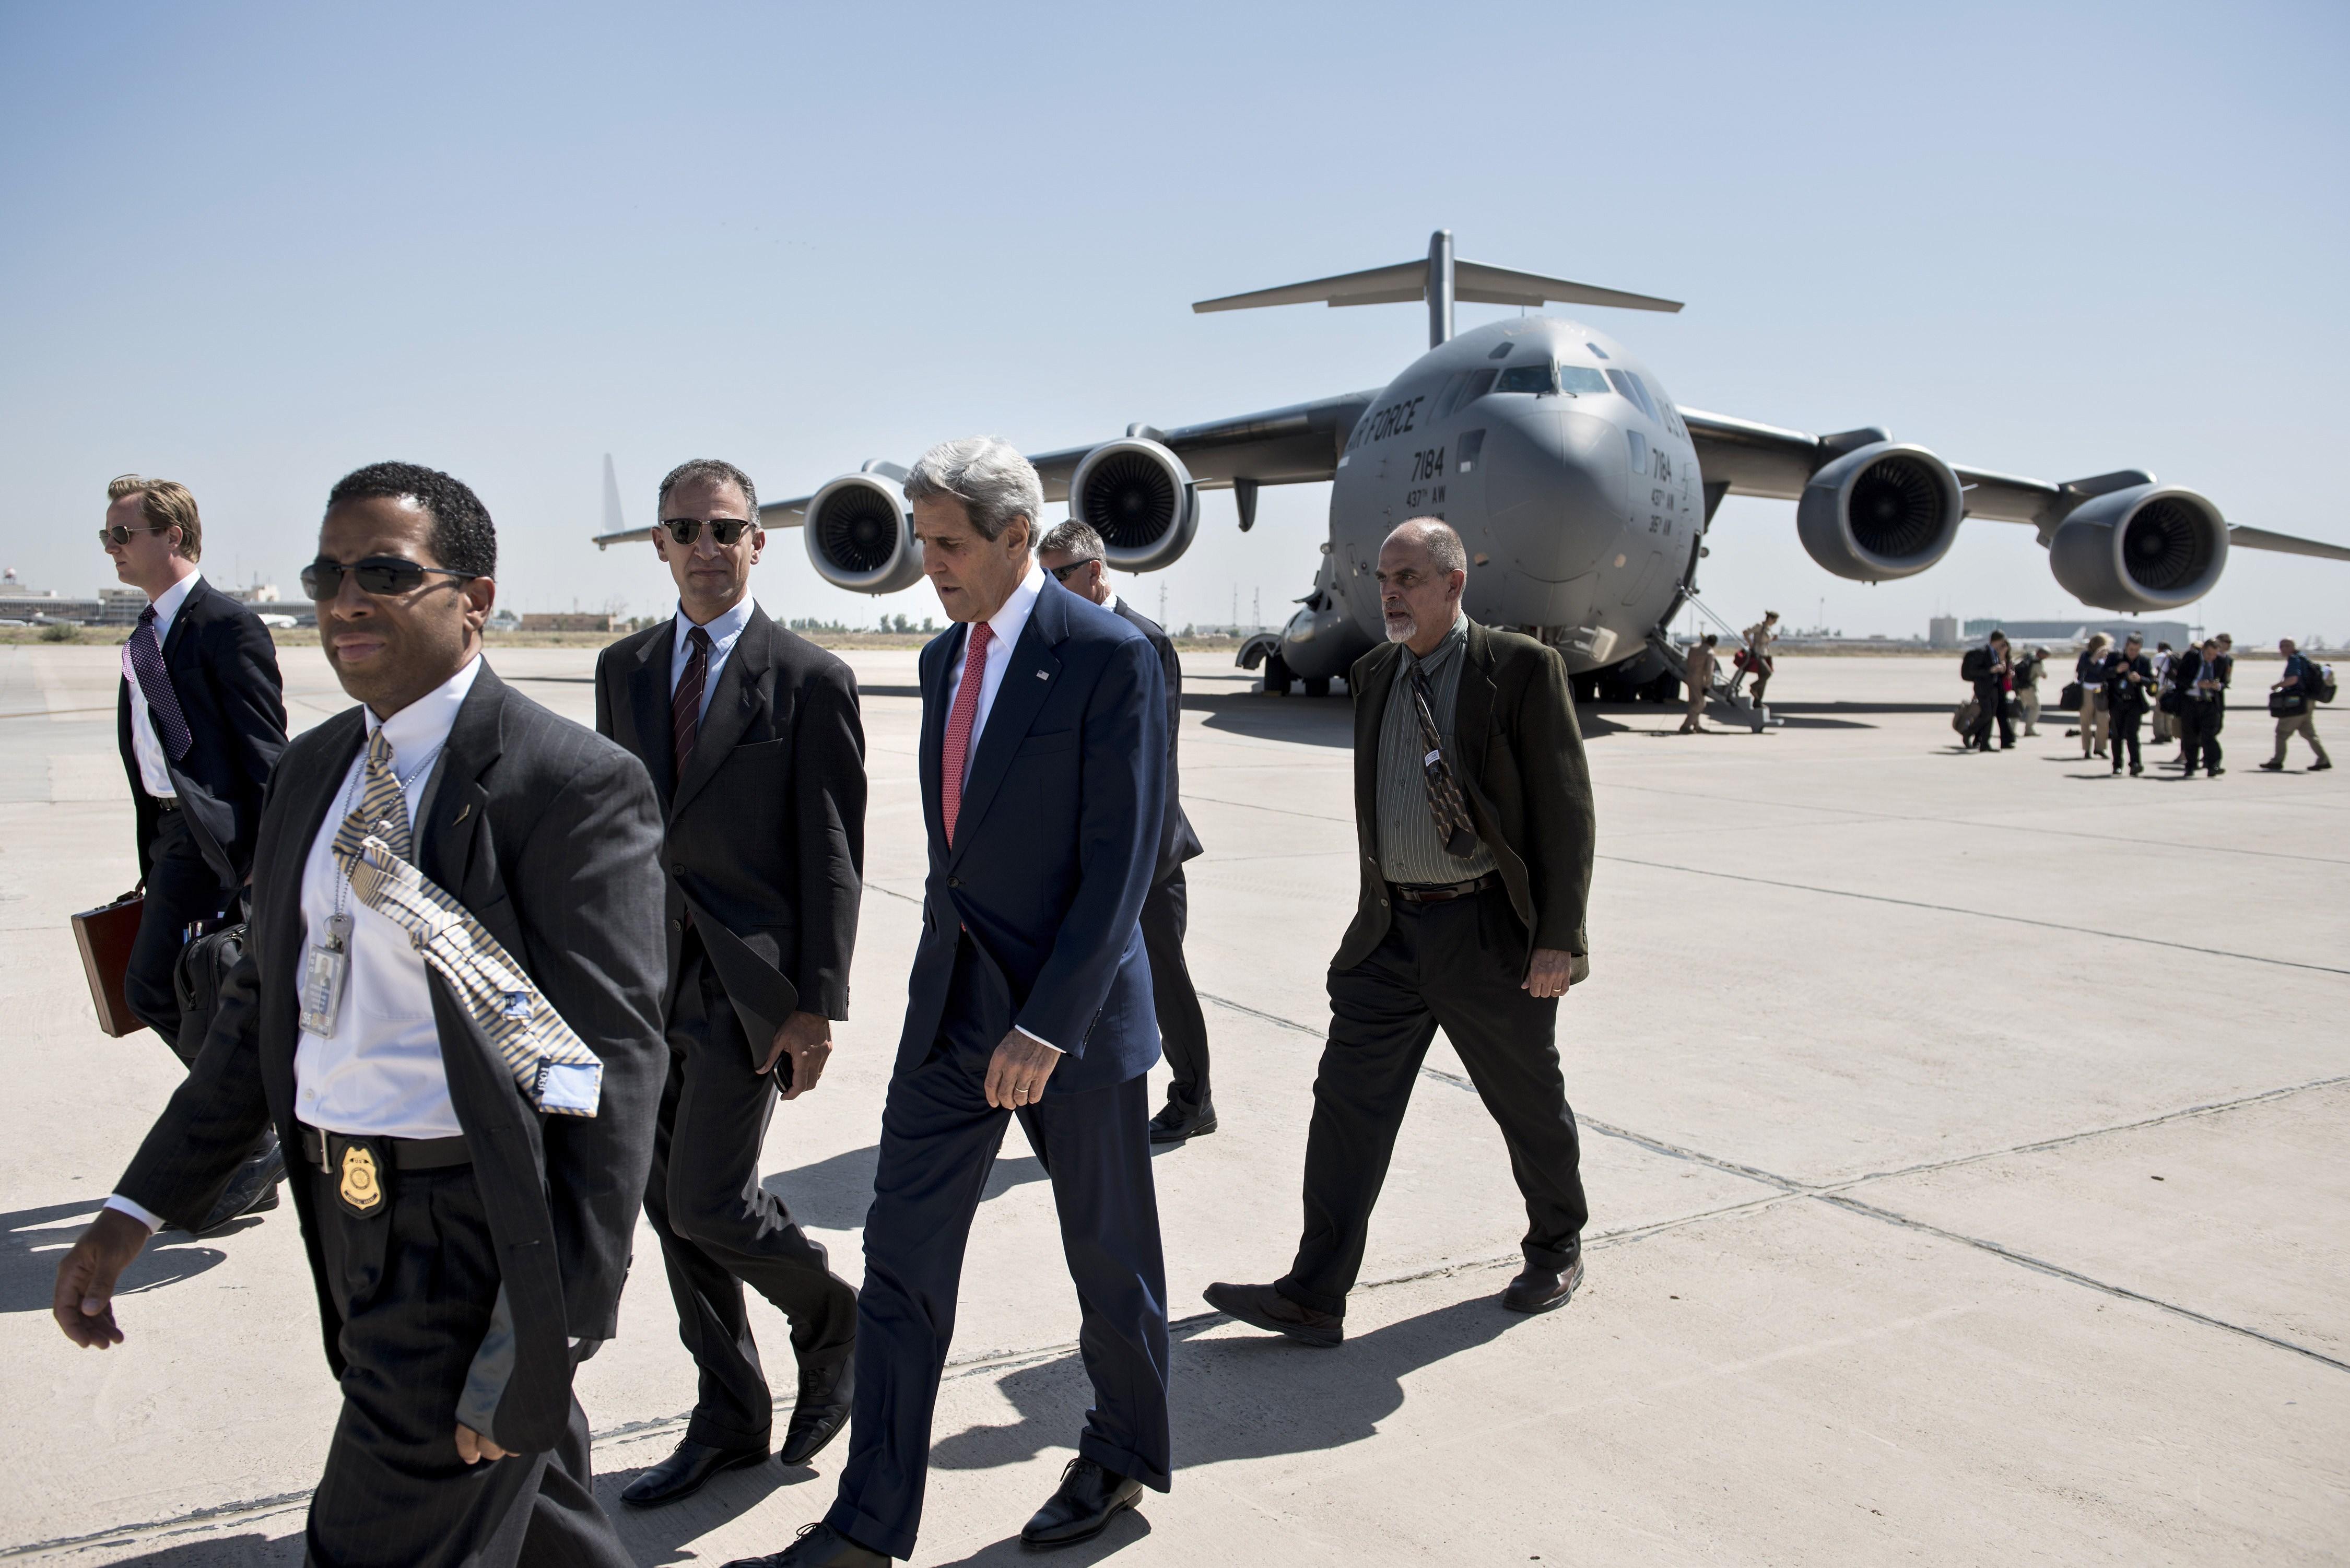 U.S. Secretary of State John Kerry (2R) arrives at Baghdad Airport on September 10, 2014.